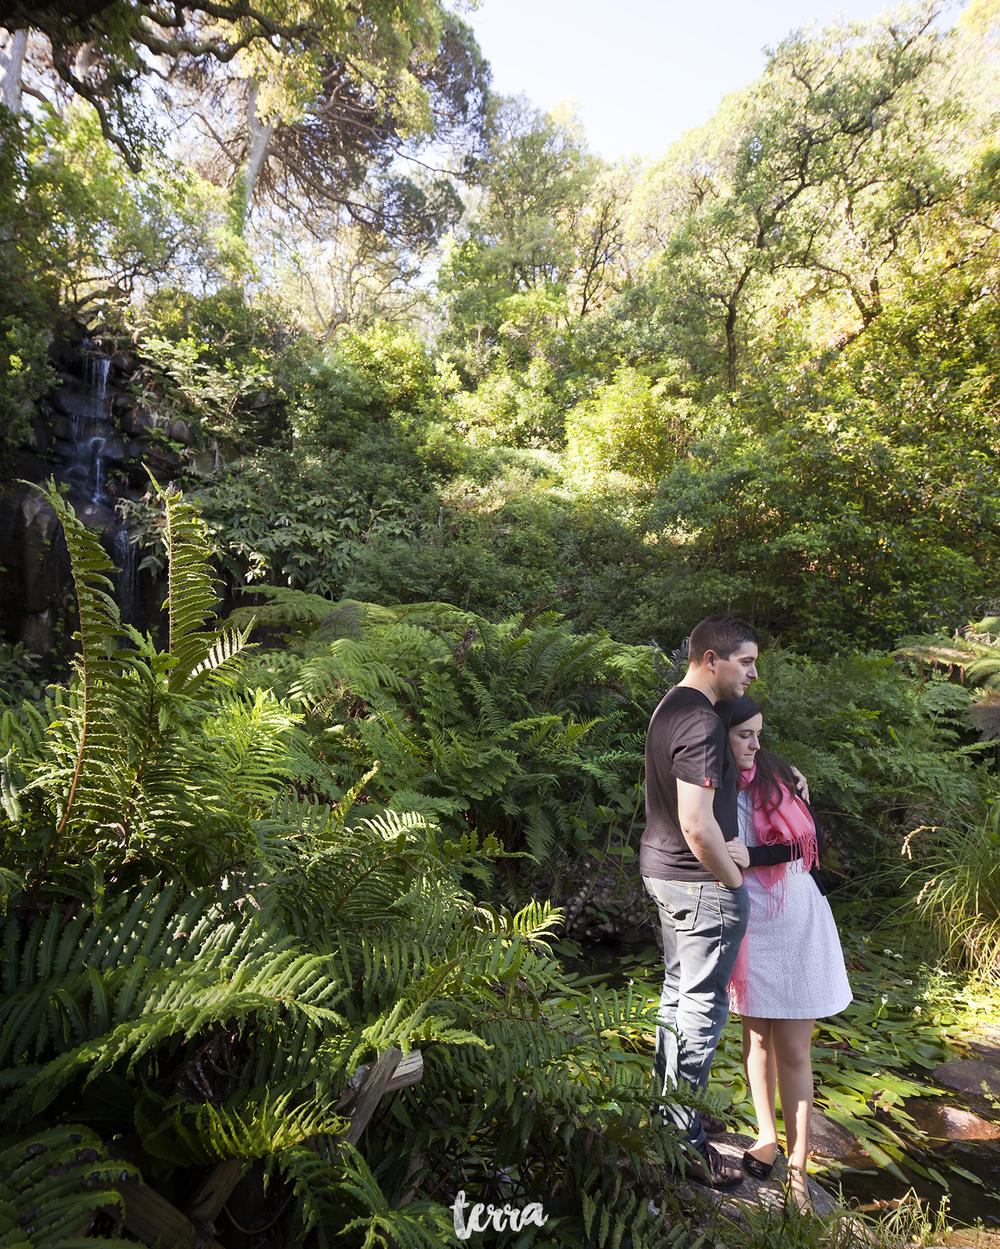 sessao-fotografica-parque-palacio-monserrate-sintra-terra-fotografia-0008.jpg